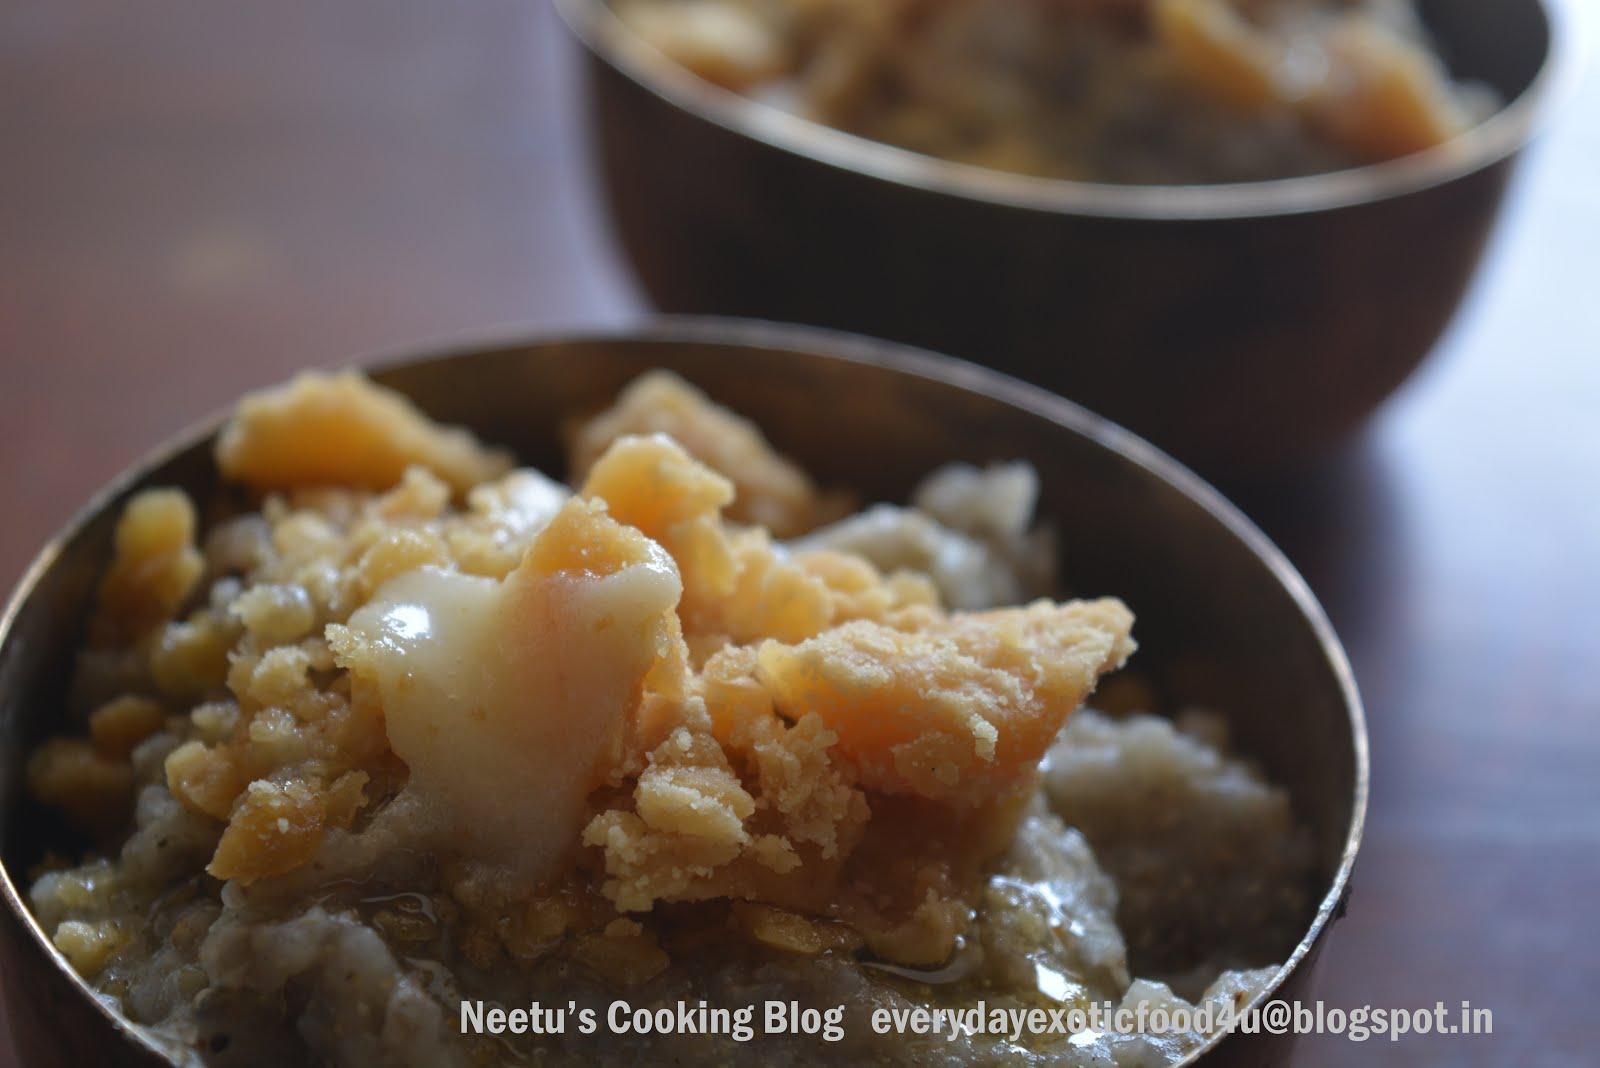 Rajasthani Kheechada/ Pearl Millet Porridge